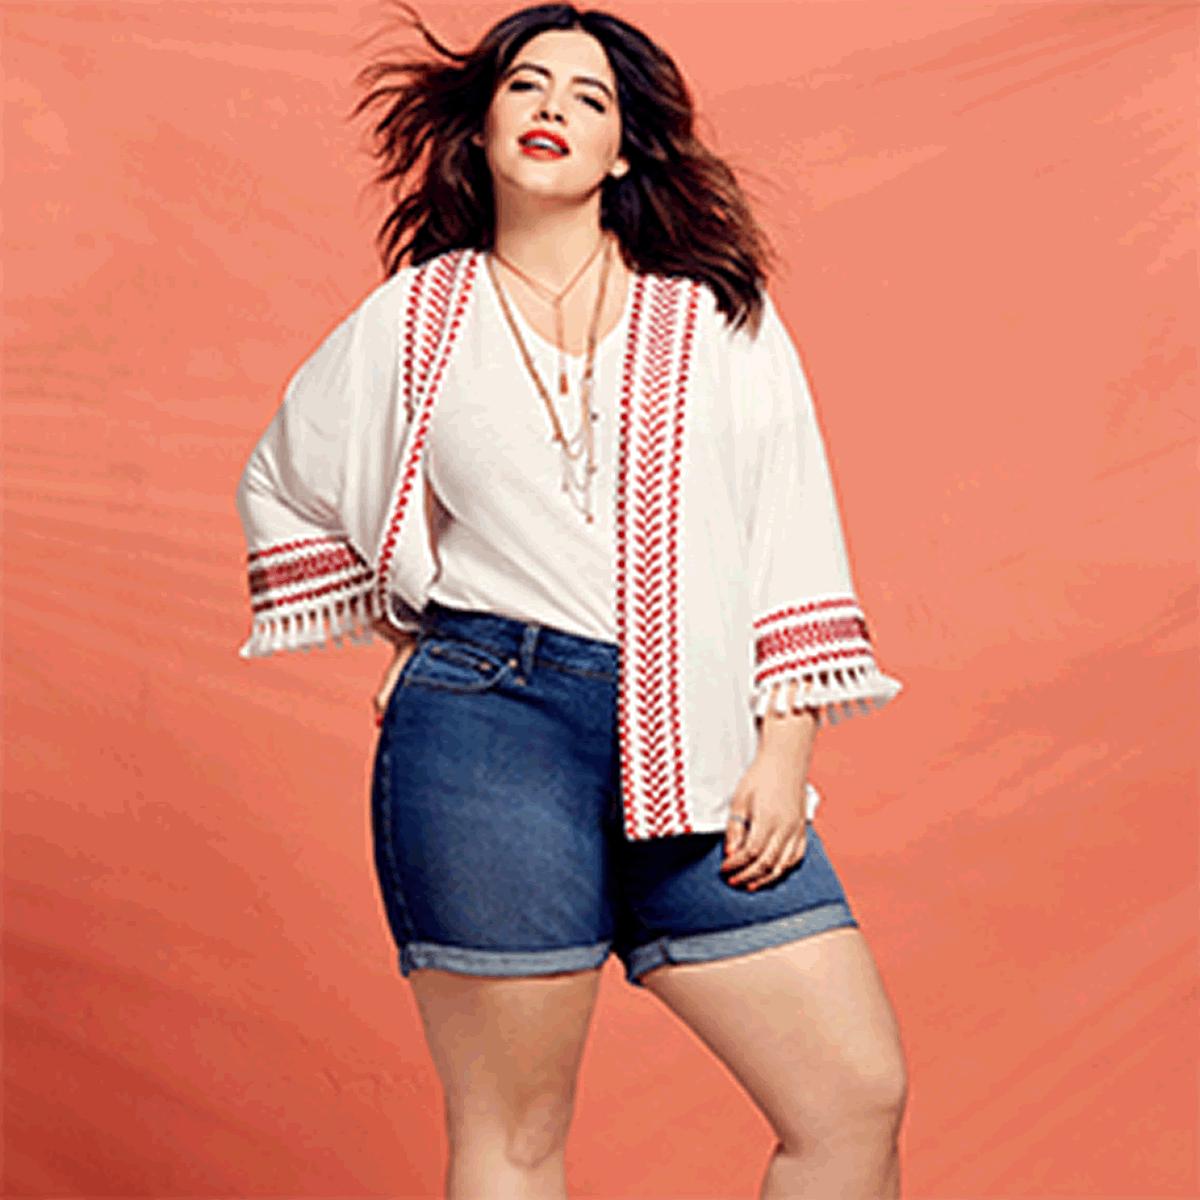 Plus Size Clothing For Women Plus Size Fashion Macys